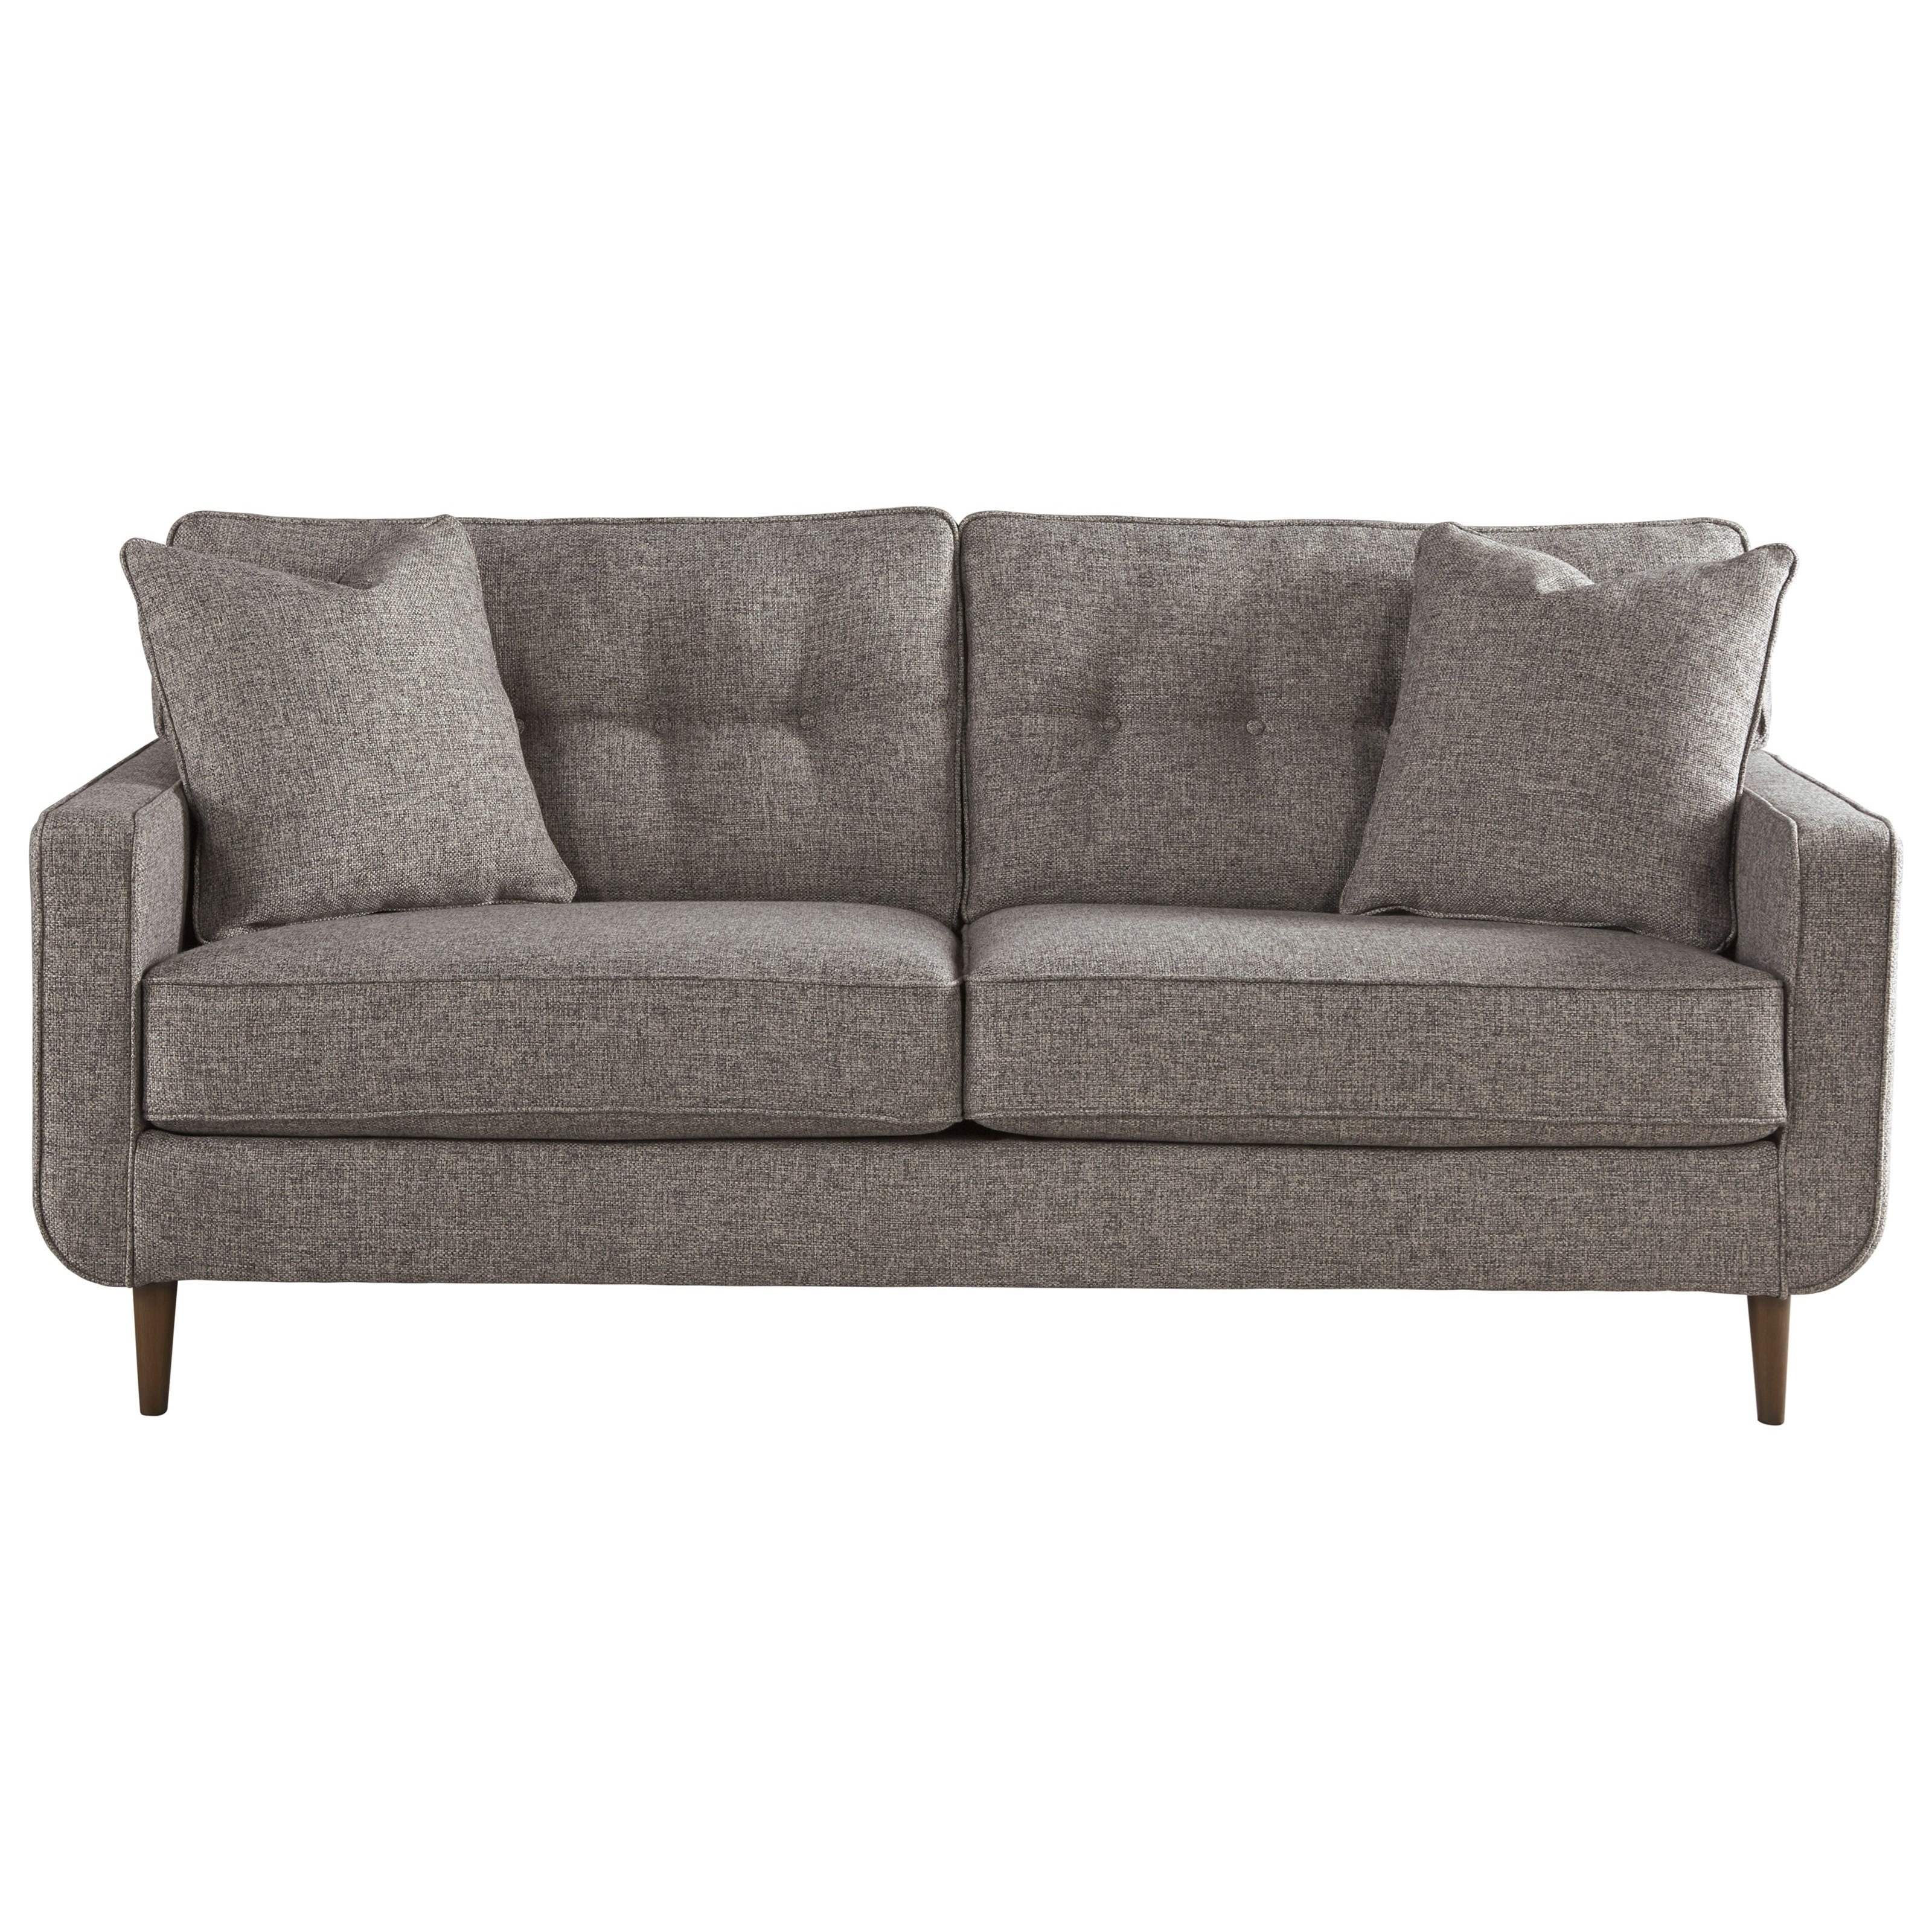 Ashley Furniture Zardoni Mid Century Modern Sofa